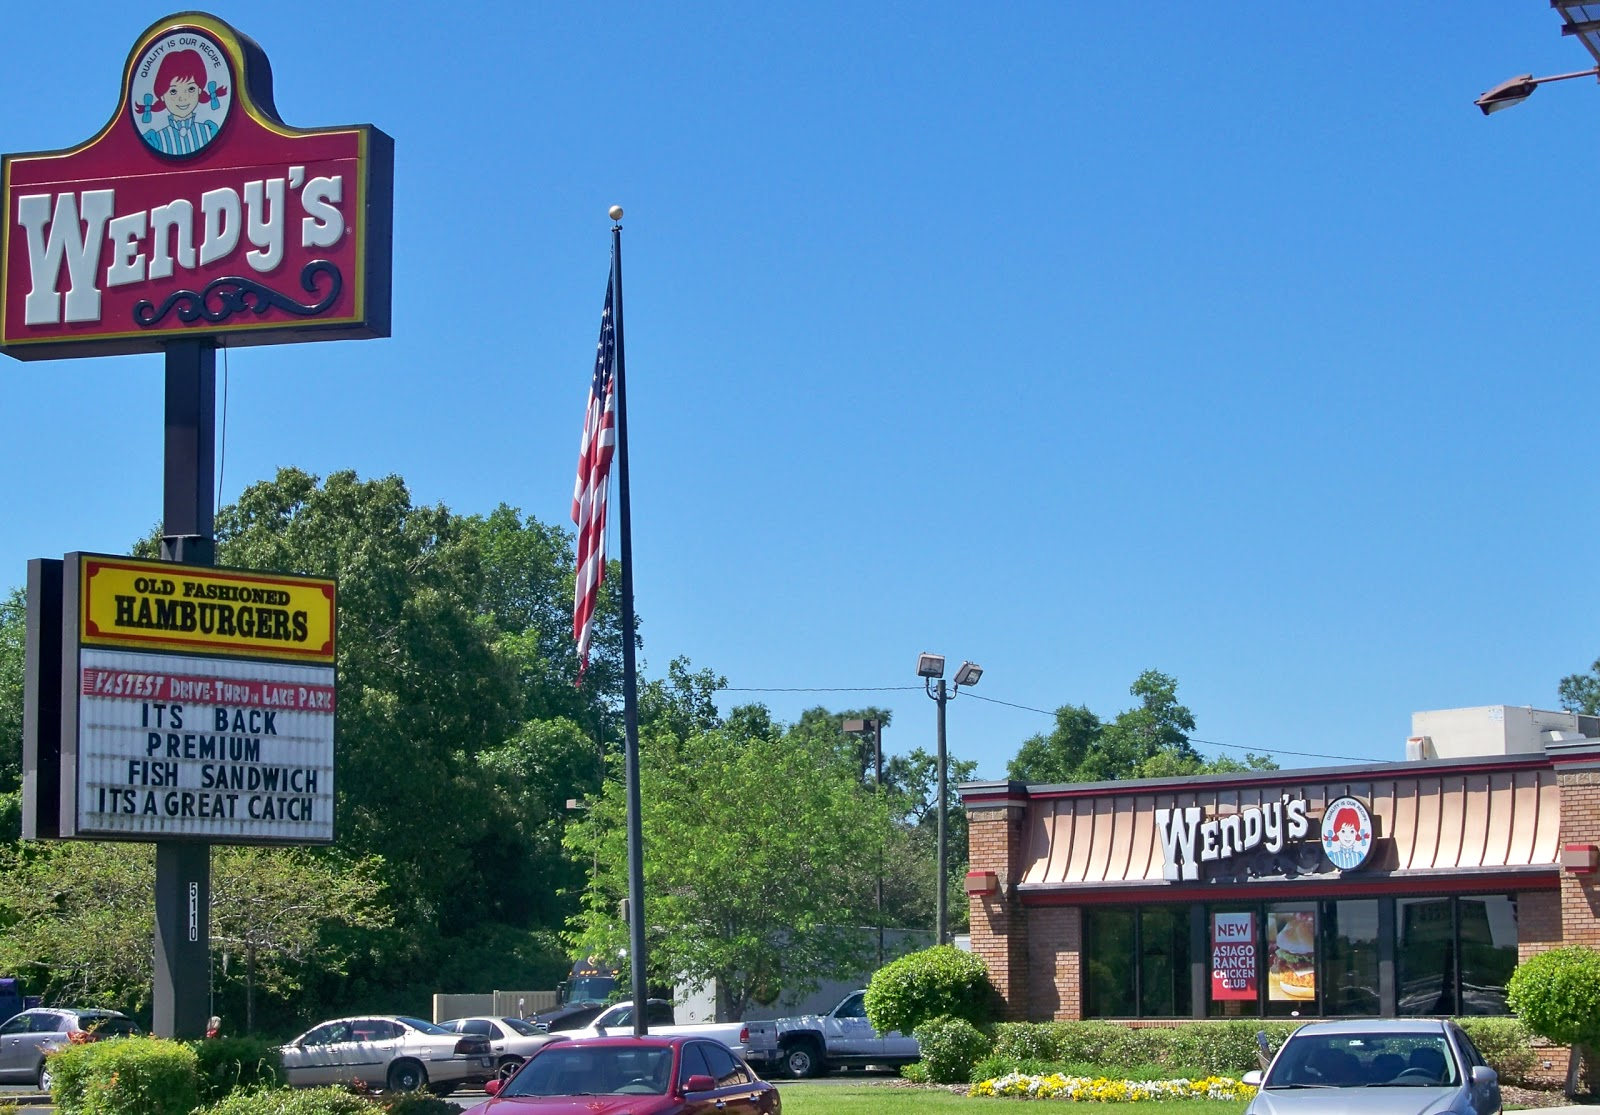 Wendy S Lake Park Valdosta Georgia Jewell Futch Road I 75 Hamburgers Fast Food Restaurant Lowndes County Ga